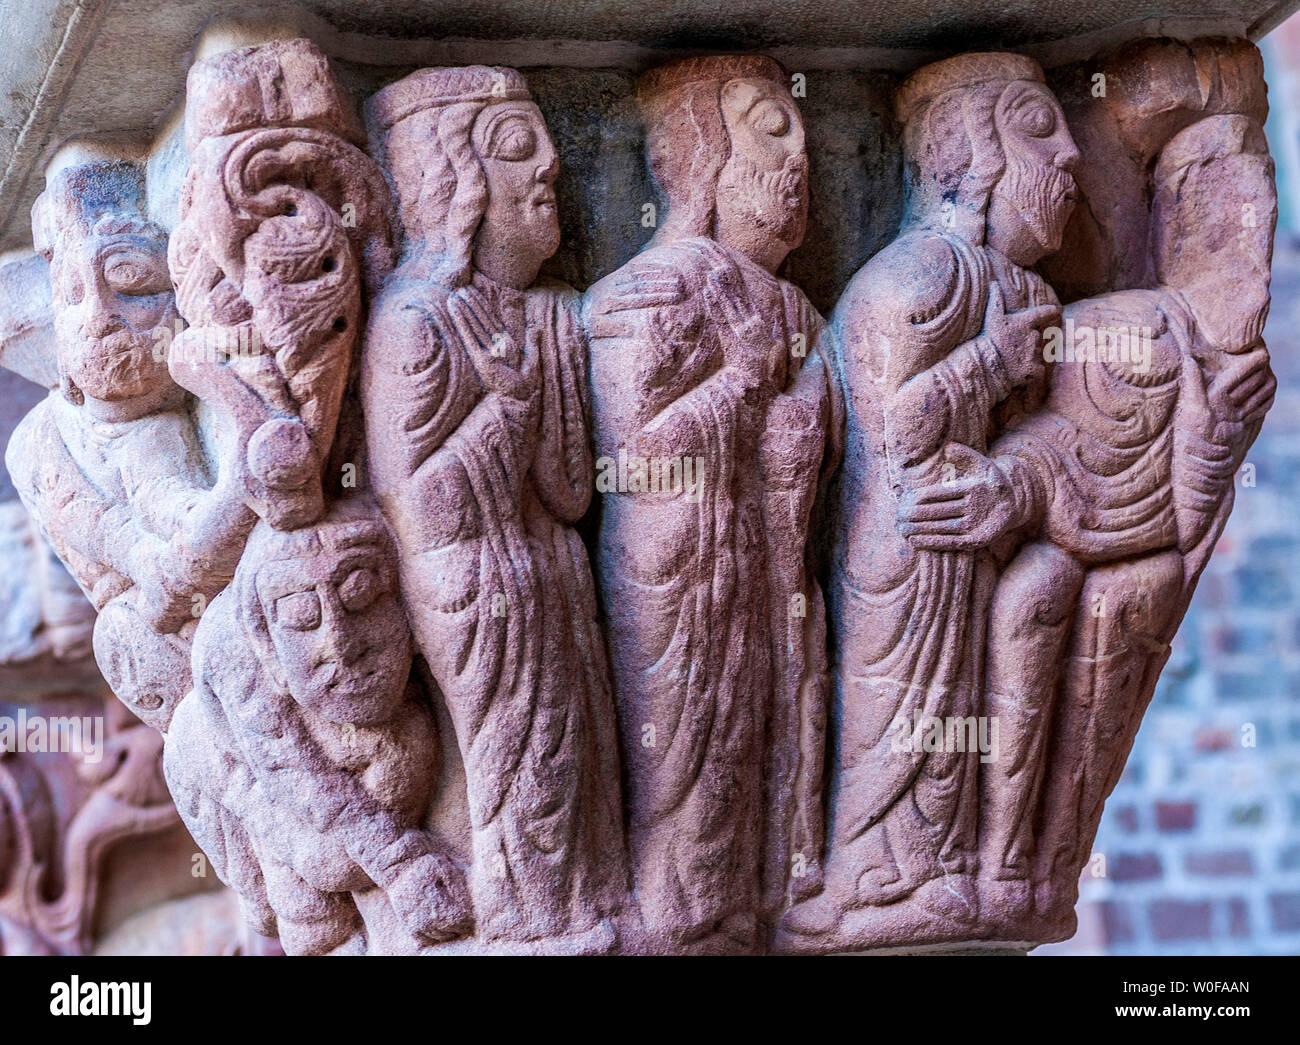 Spain, Pyrenees, Autonomous community of Aragon, old monastery of San Juan de la Pena (10th century), historiated capital of the cloister (Saint James way) - Stock Image